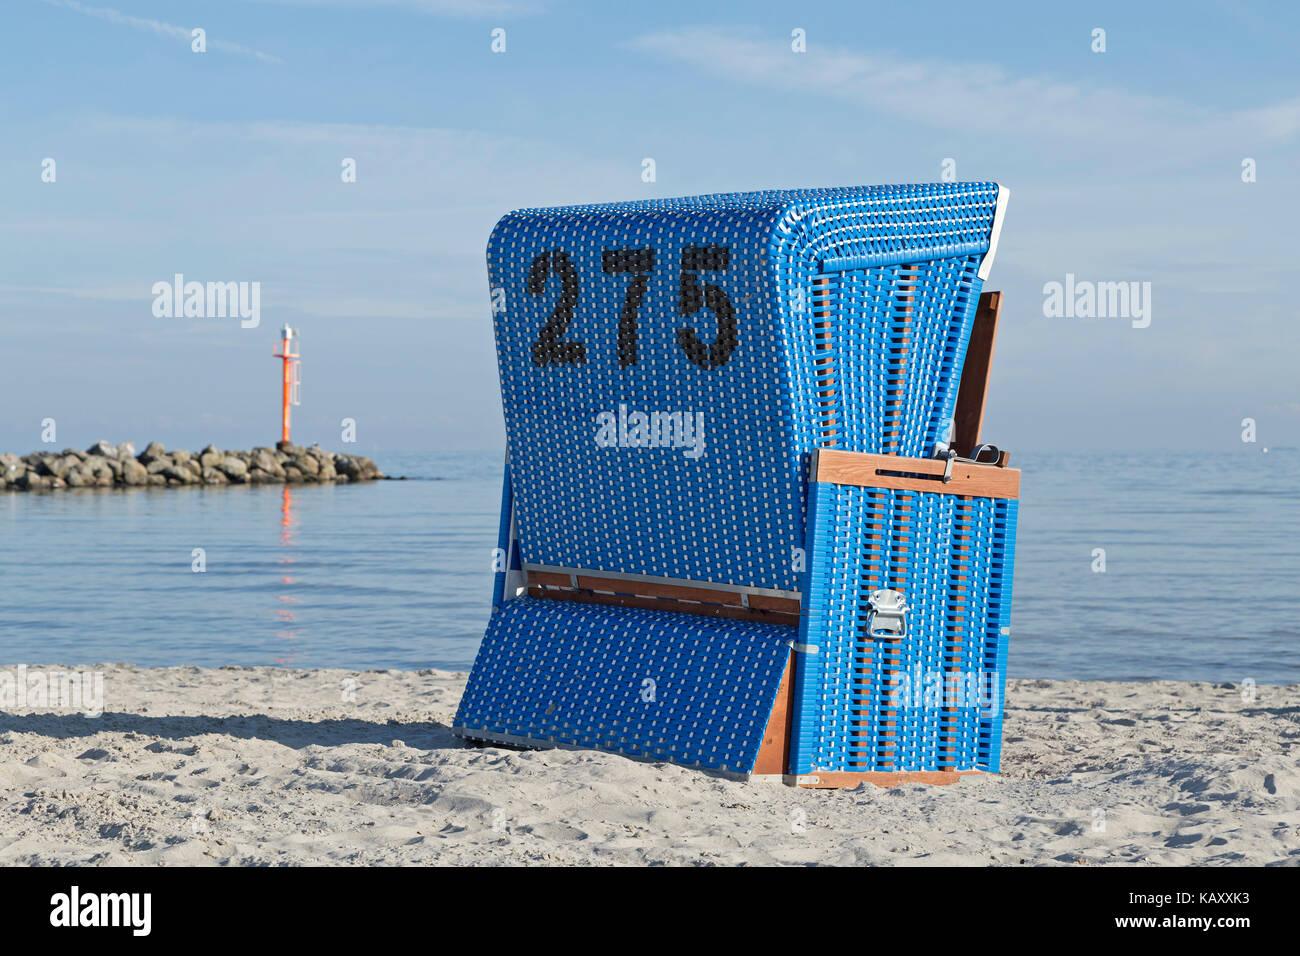 baltic seashore stock photos baltic seashore stock images alamy. Black Bedroom Furniture Sets. Home Design Ideas